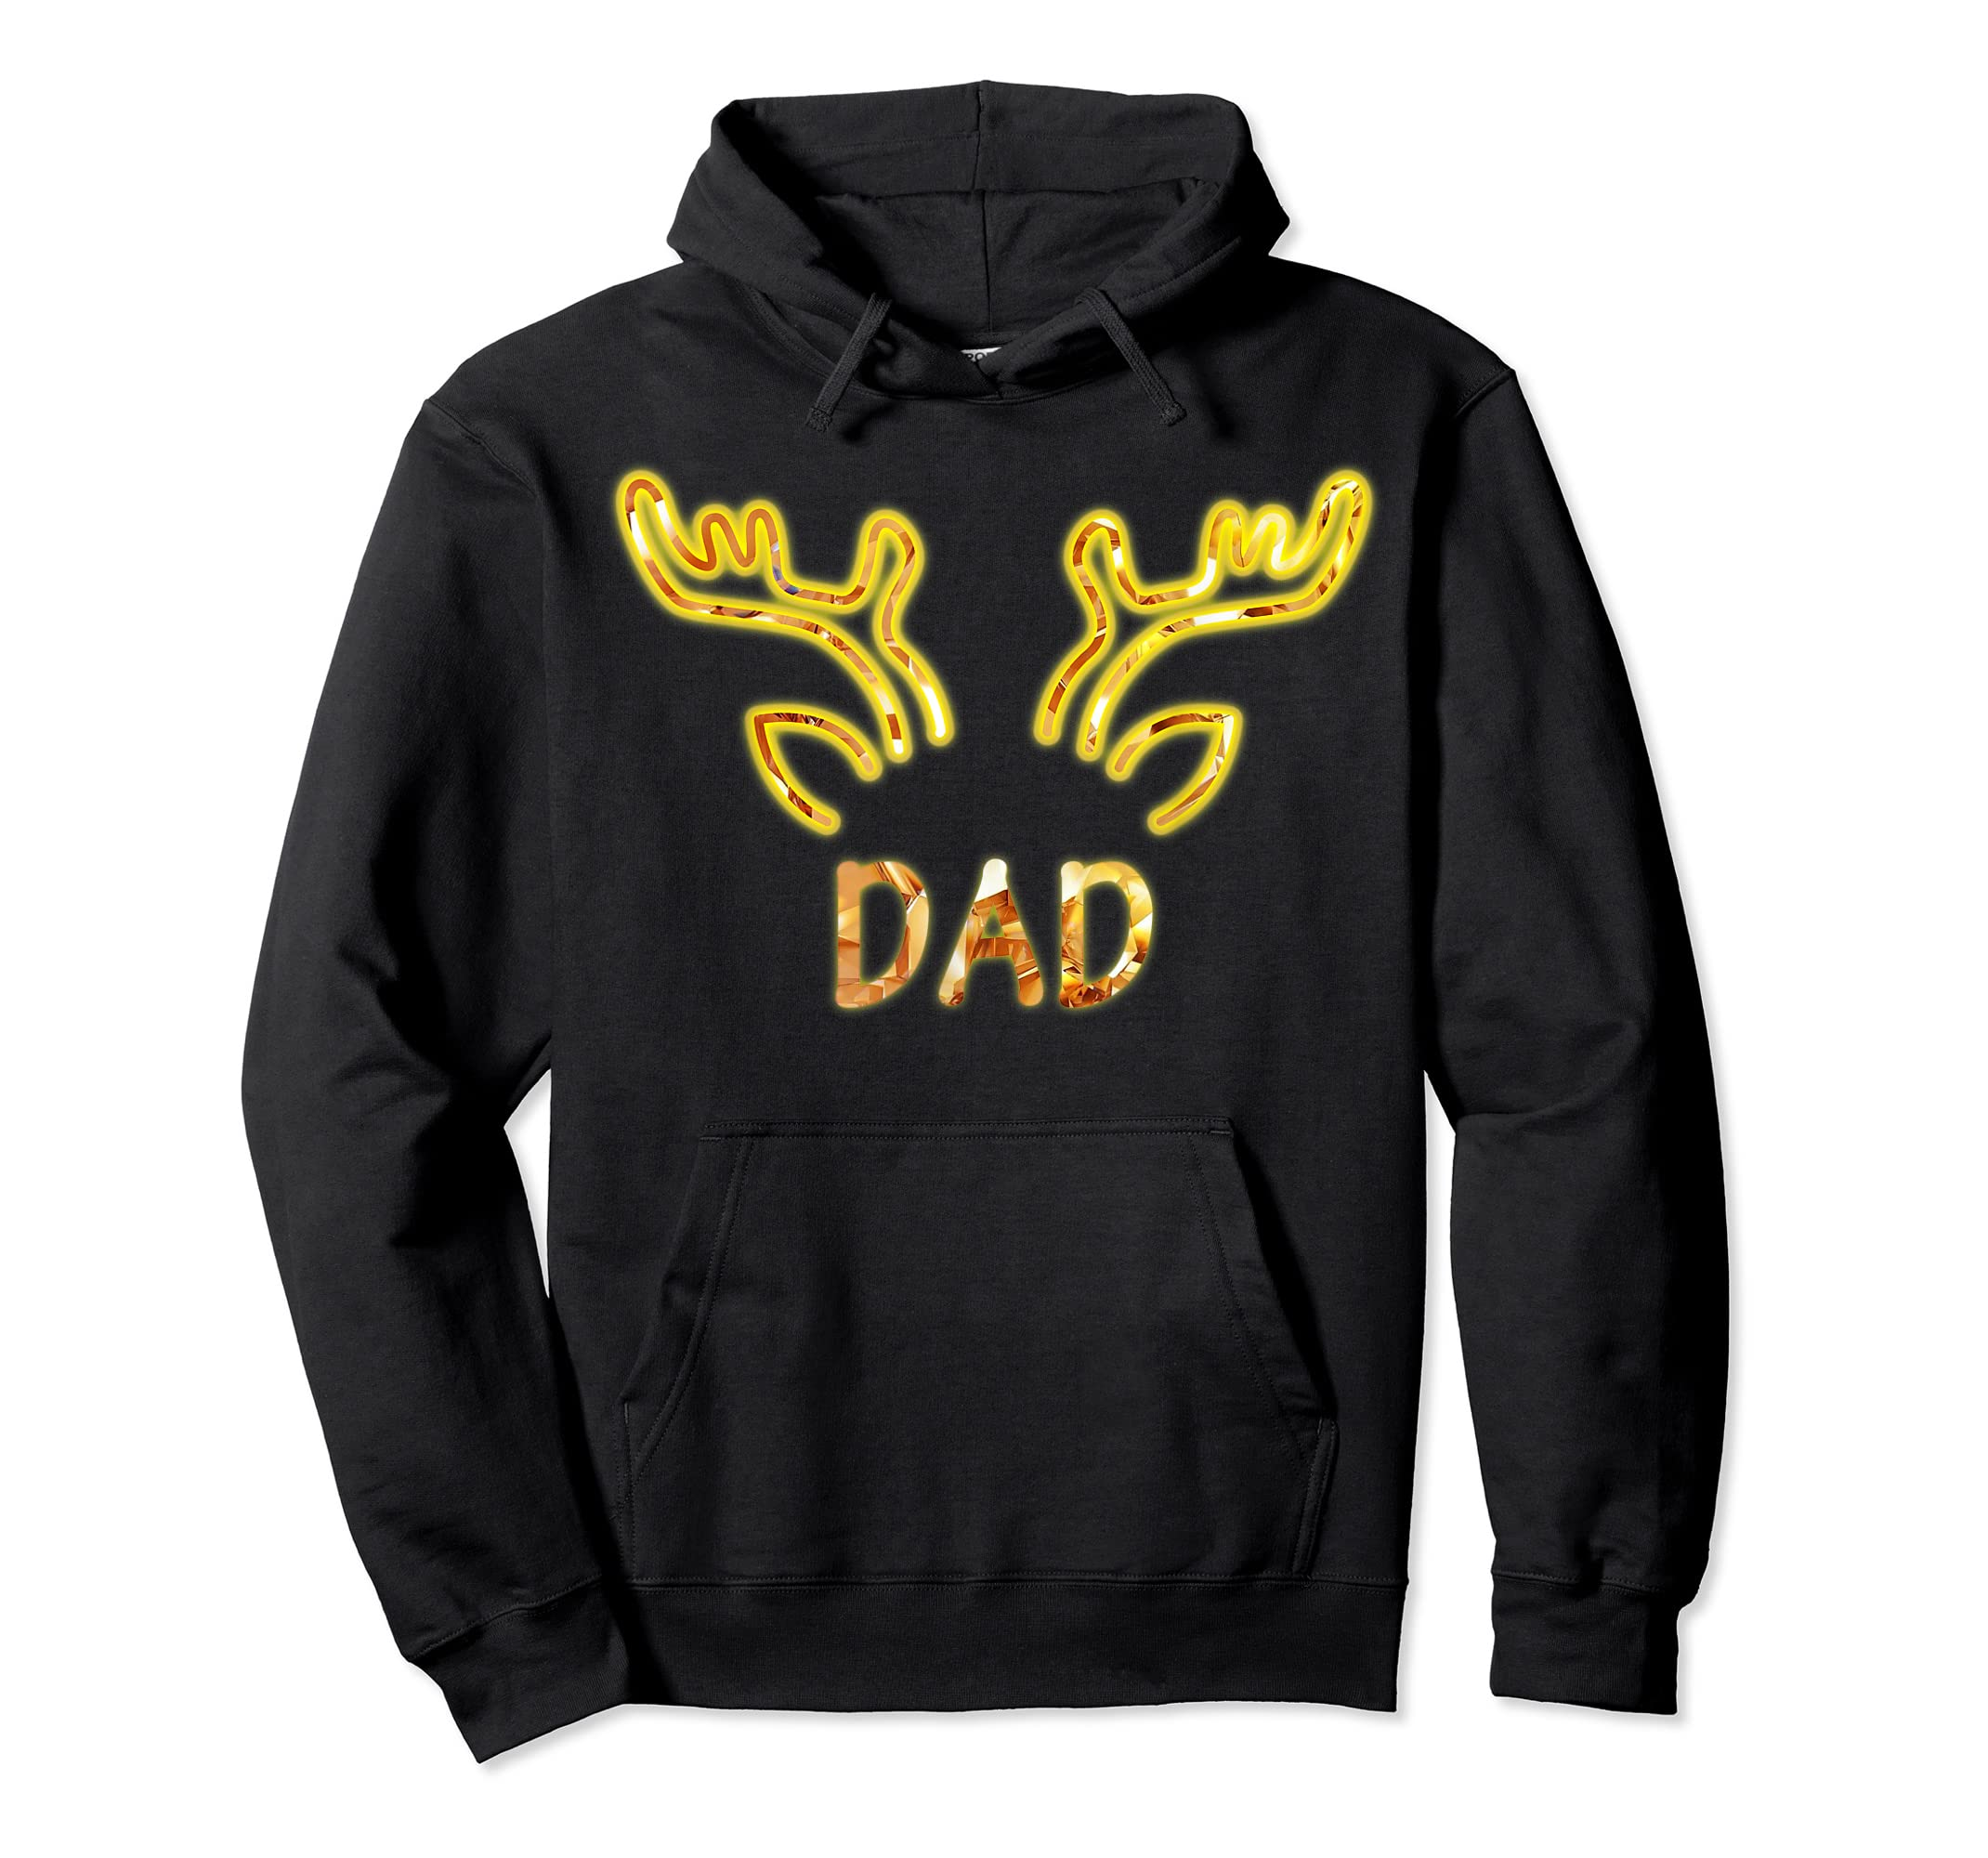 Dad Reindeer Matching Family Christmas T-Shirt T-Shirt-Hoodie-Black